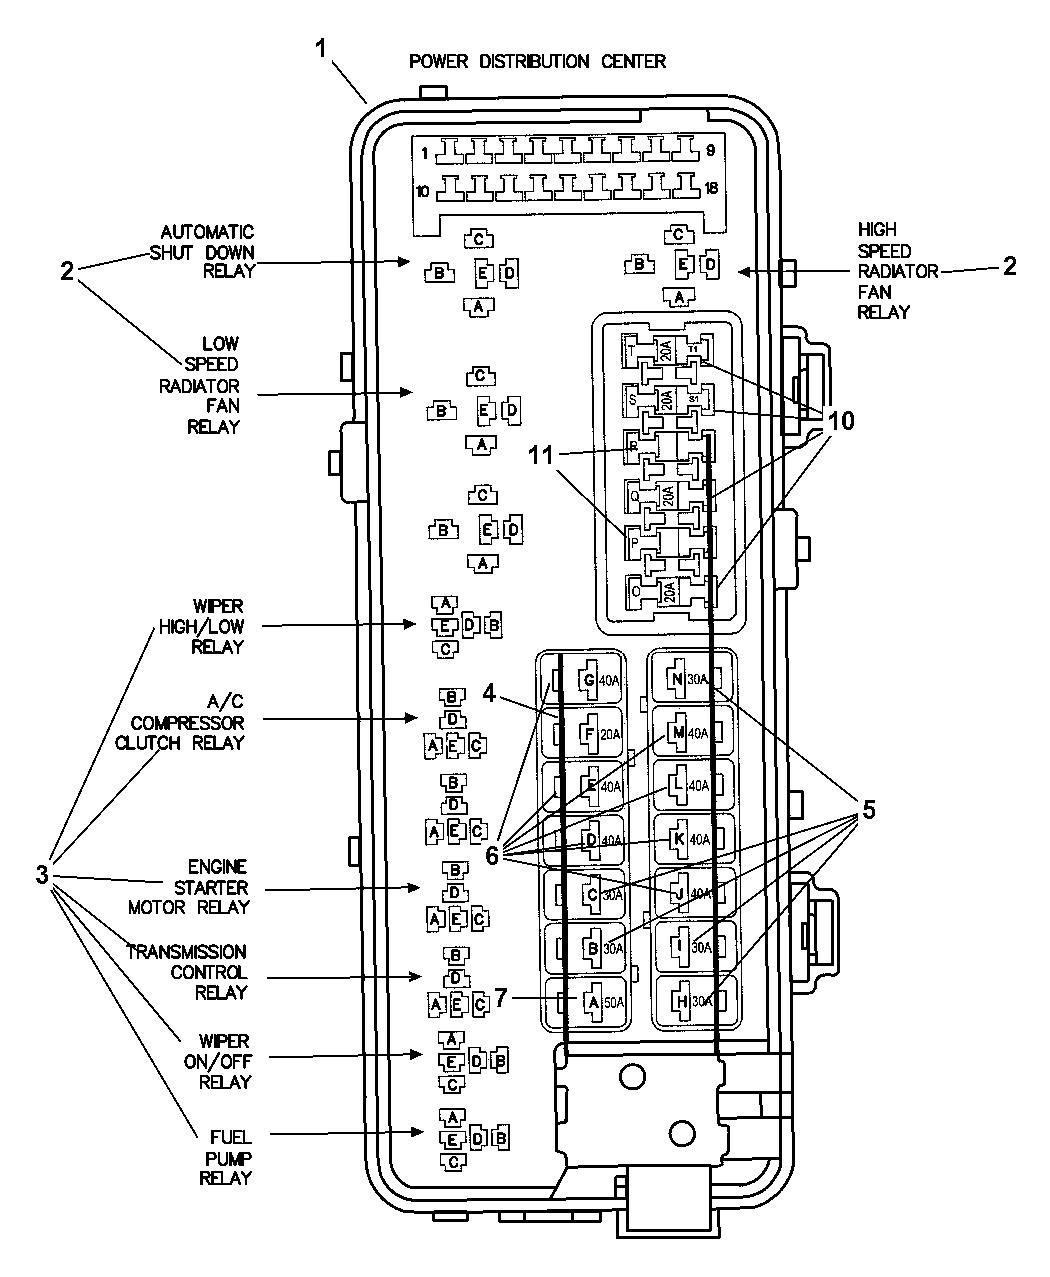 fuse box diagram for 2003 dodge intrepid wiring library dodge intrepid steering column wiring